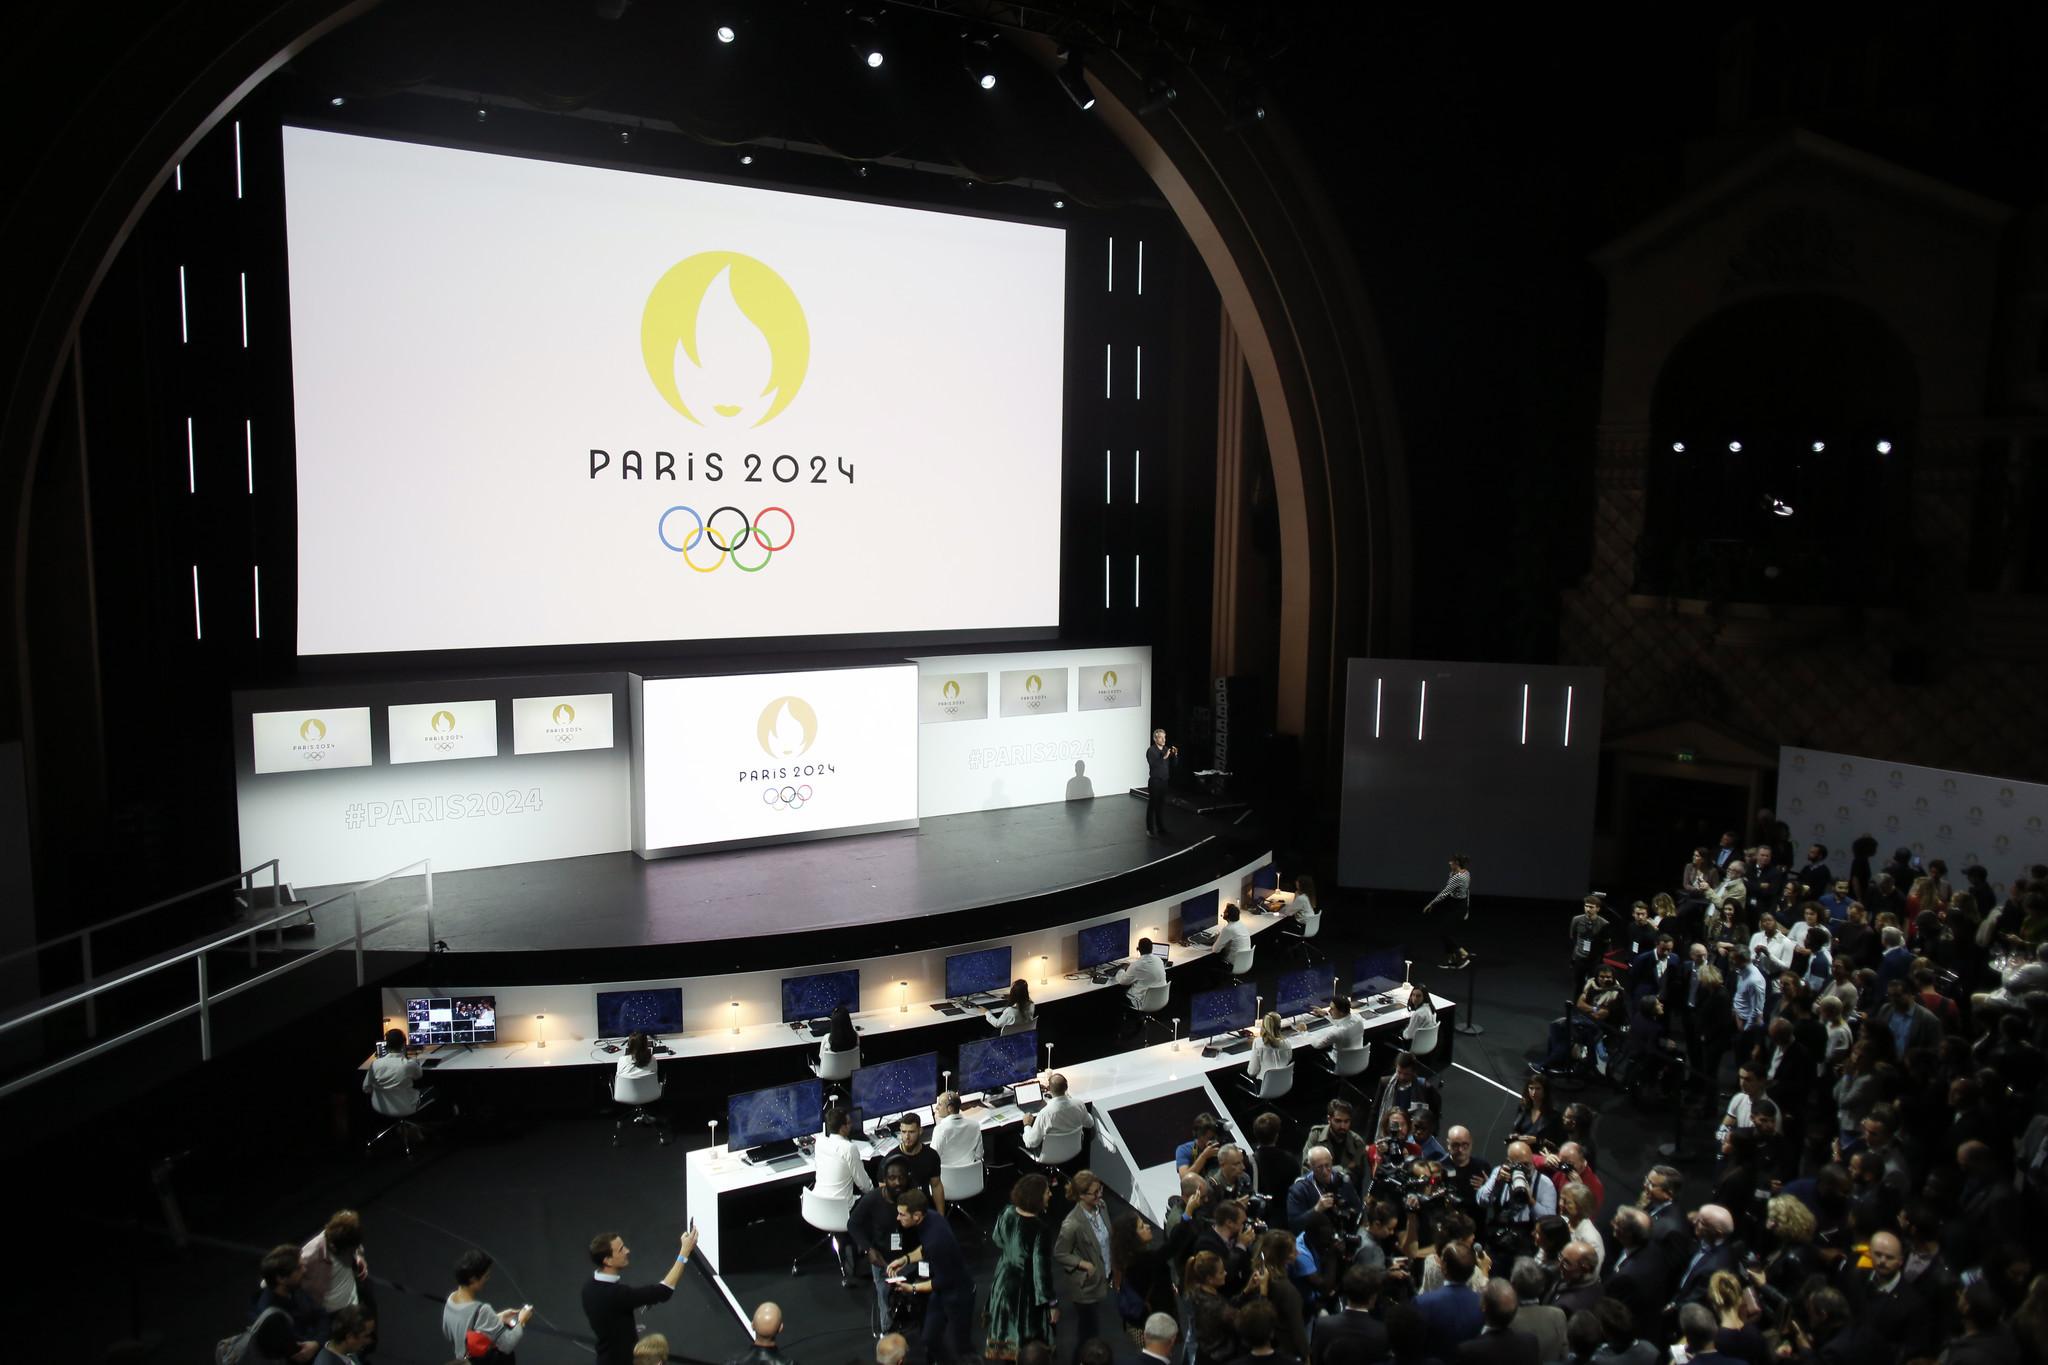 Best reactions to 2024 Paris Olympics logo